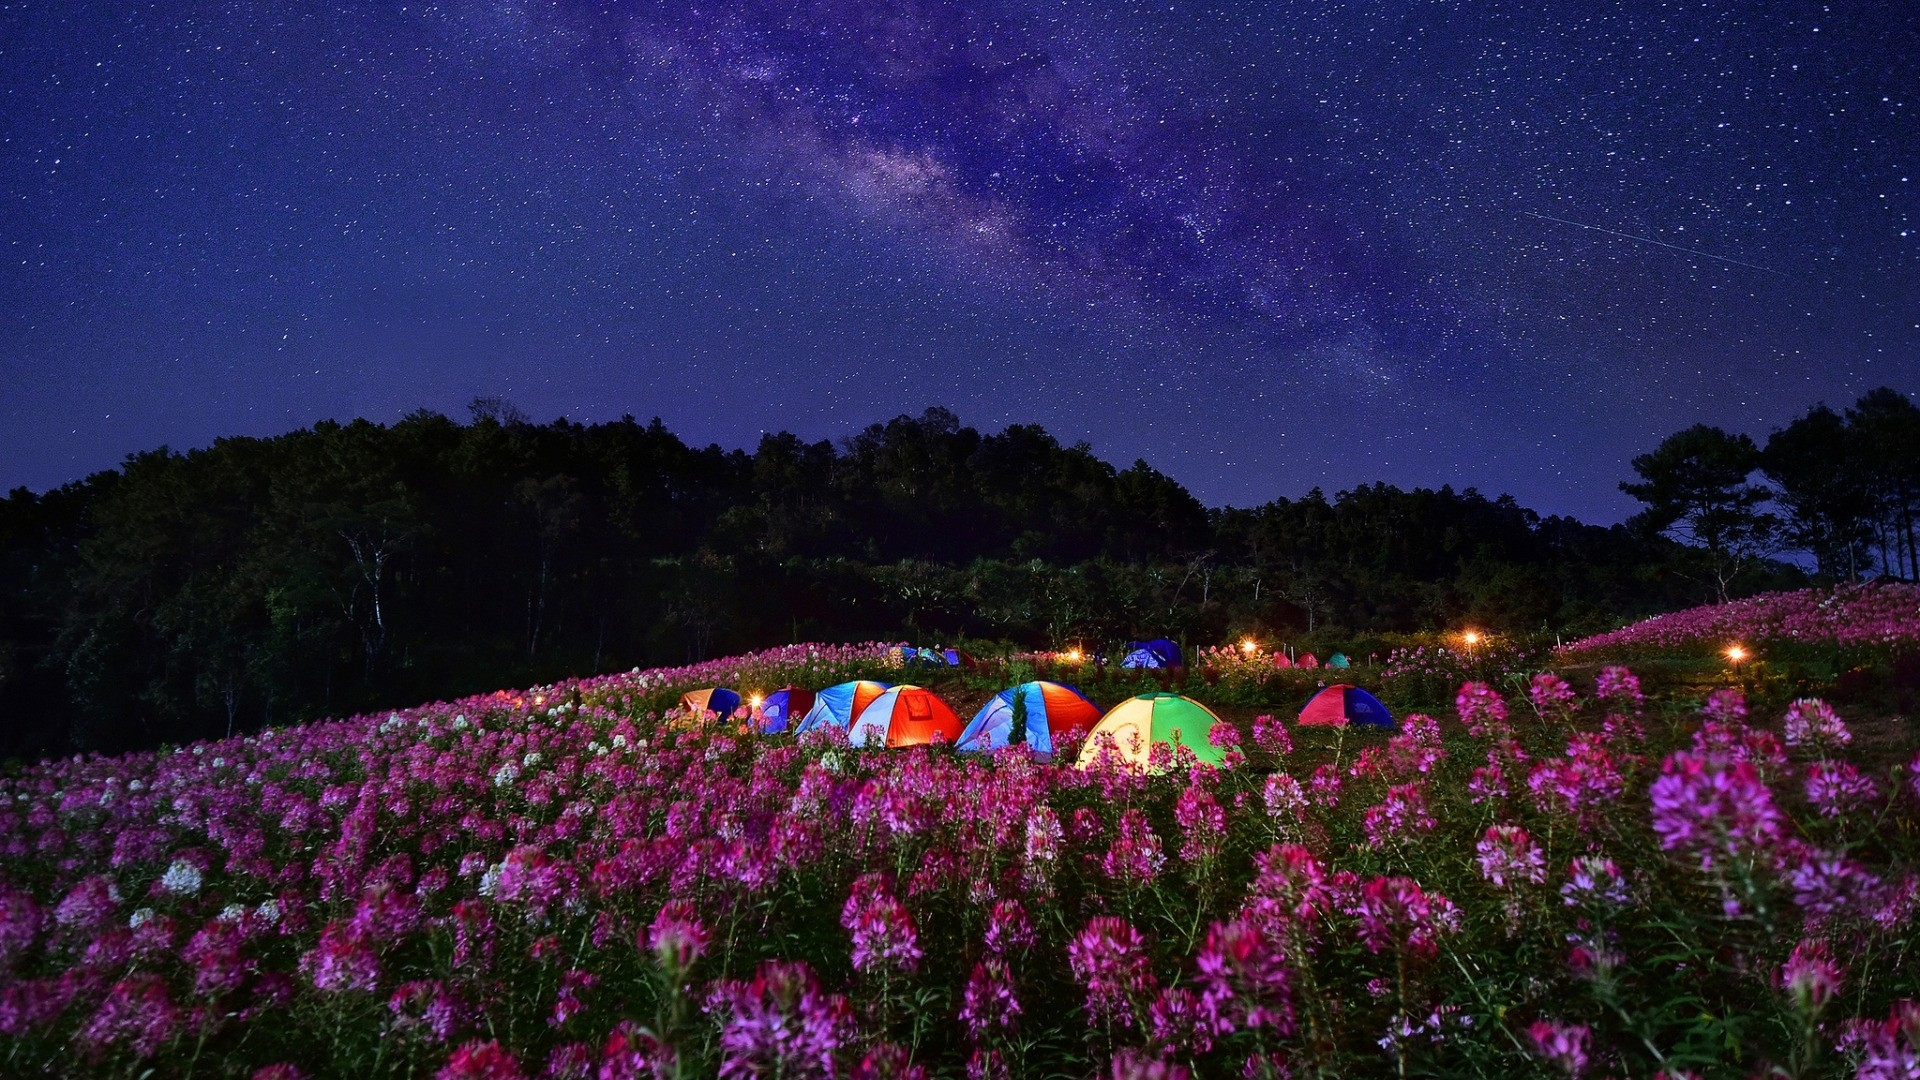 Camping HD Wallpaper